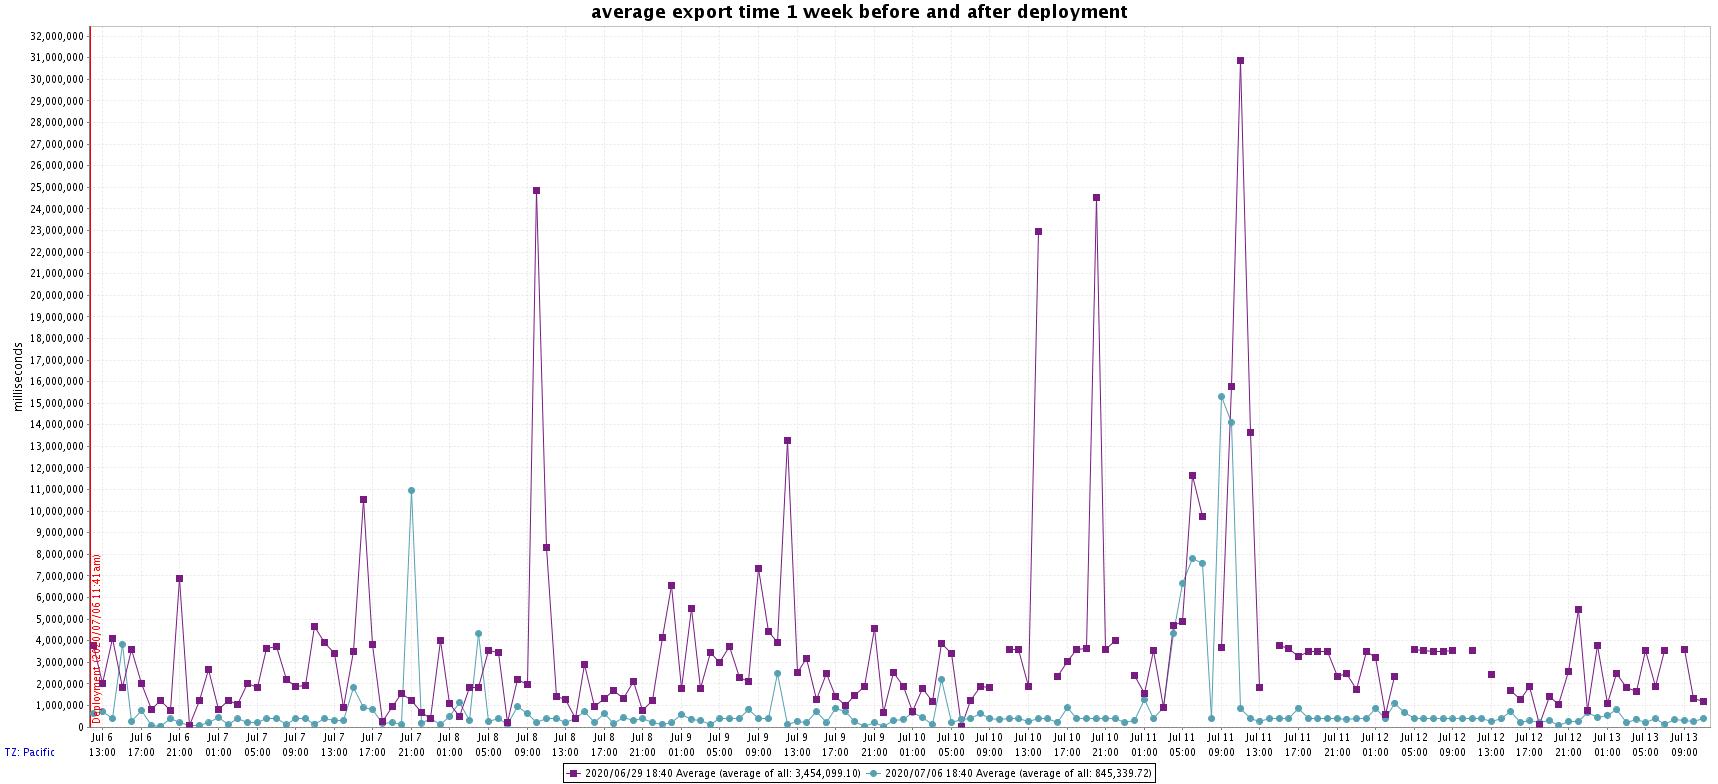 Figure 1 – Average Export Time